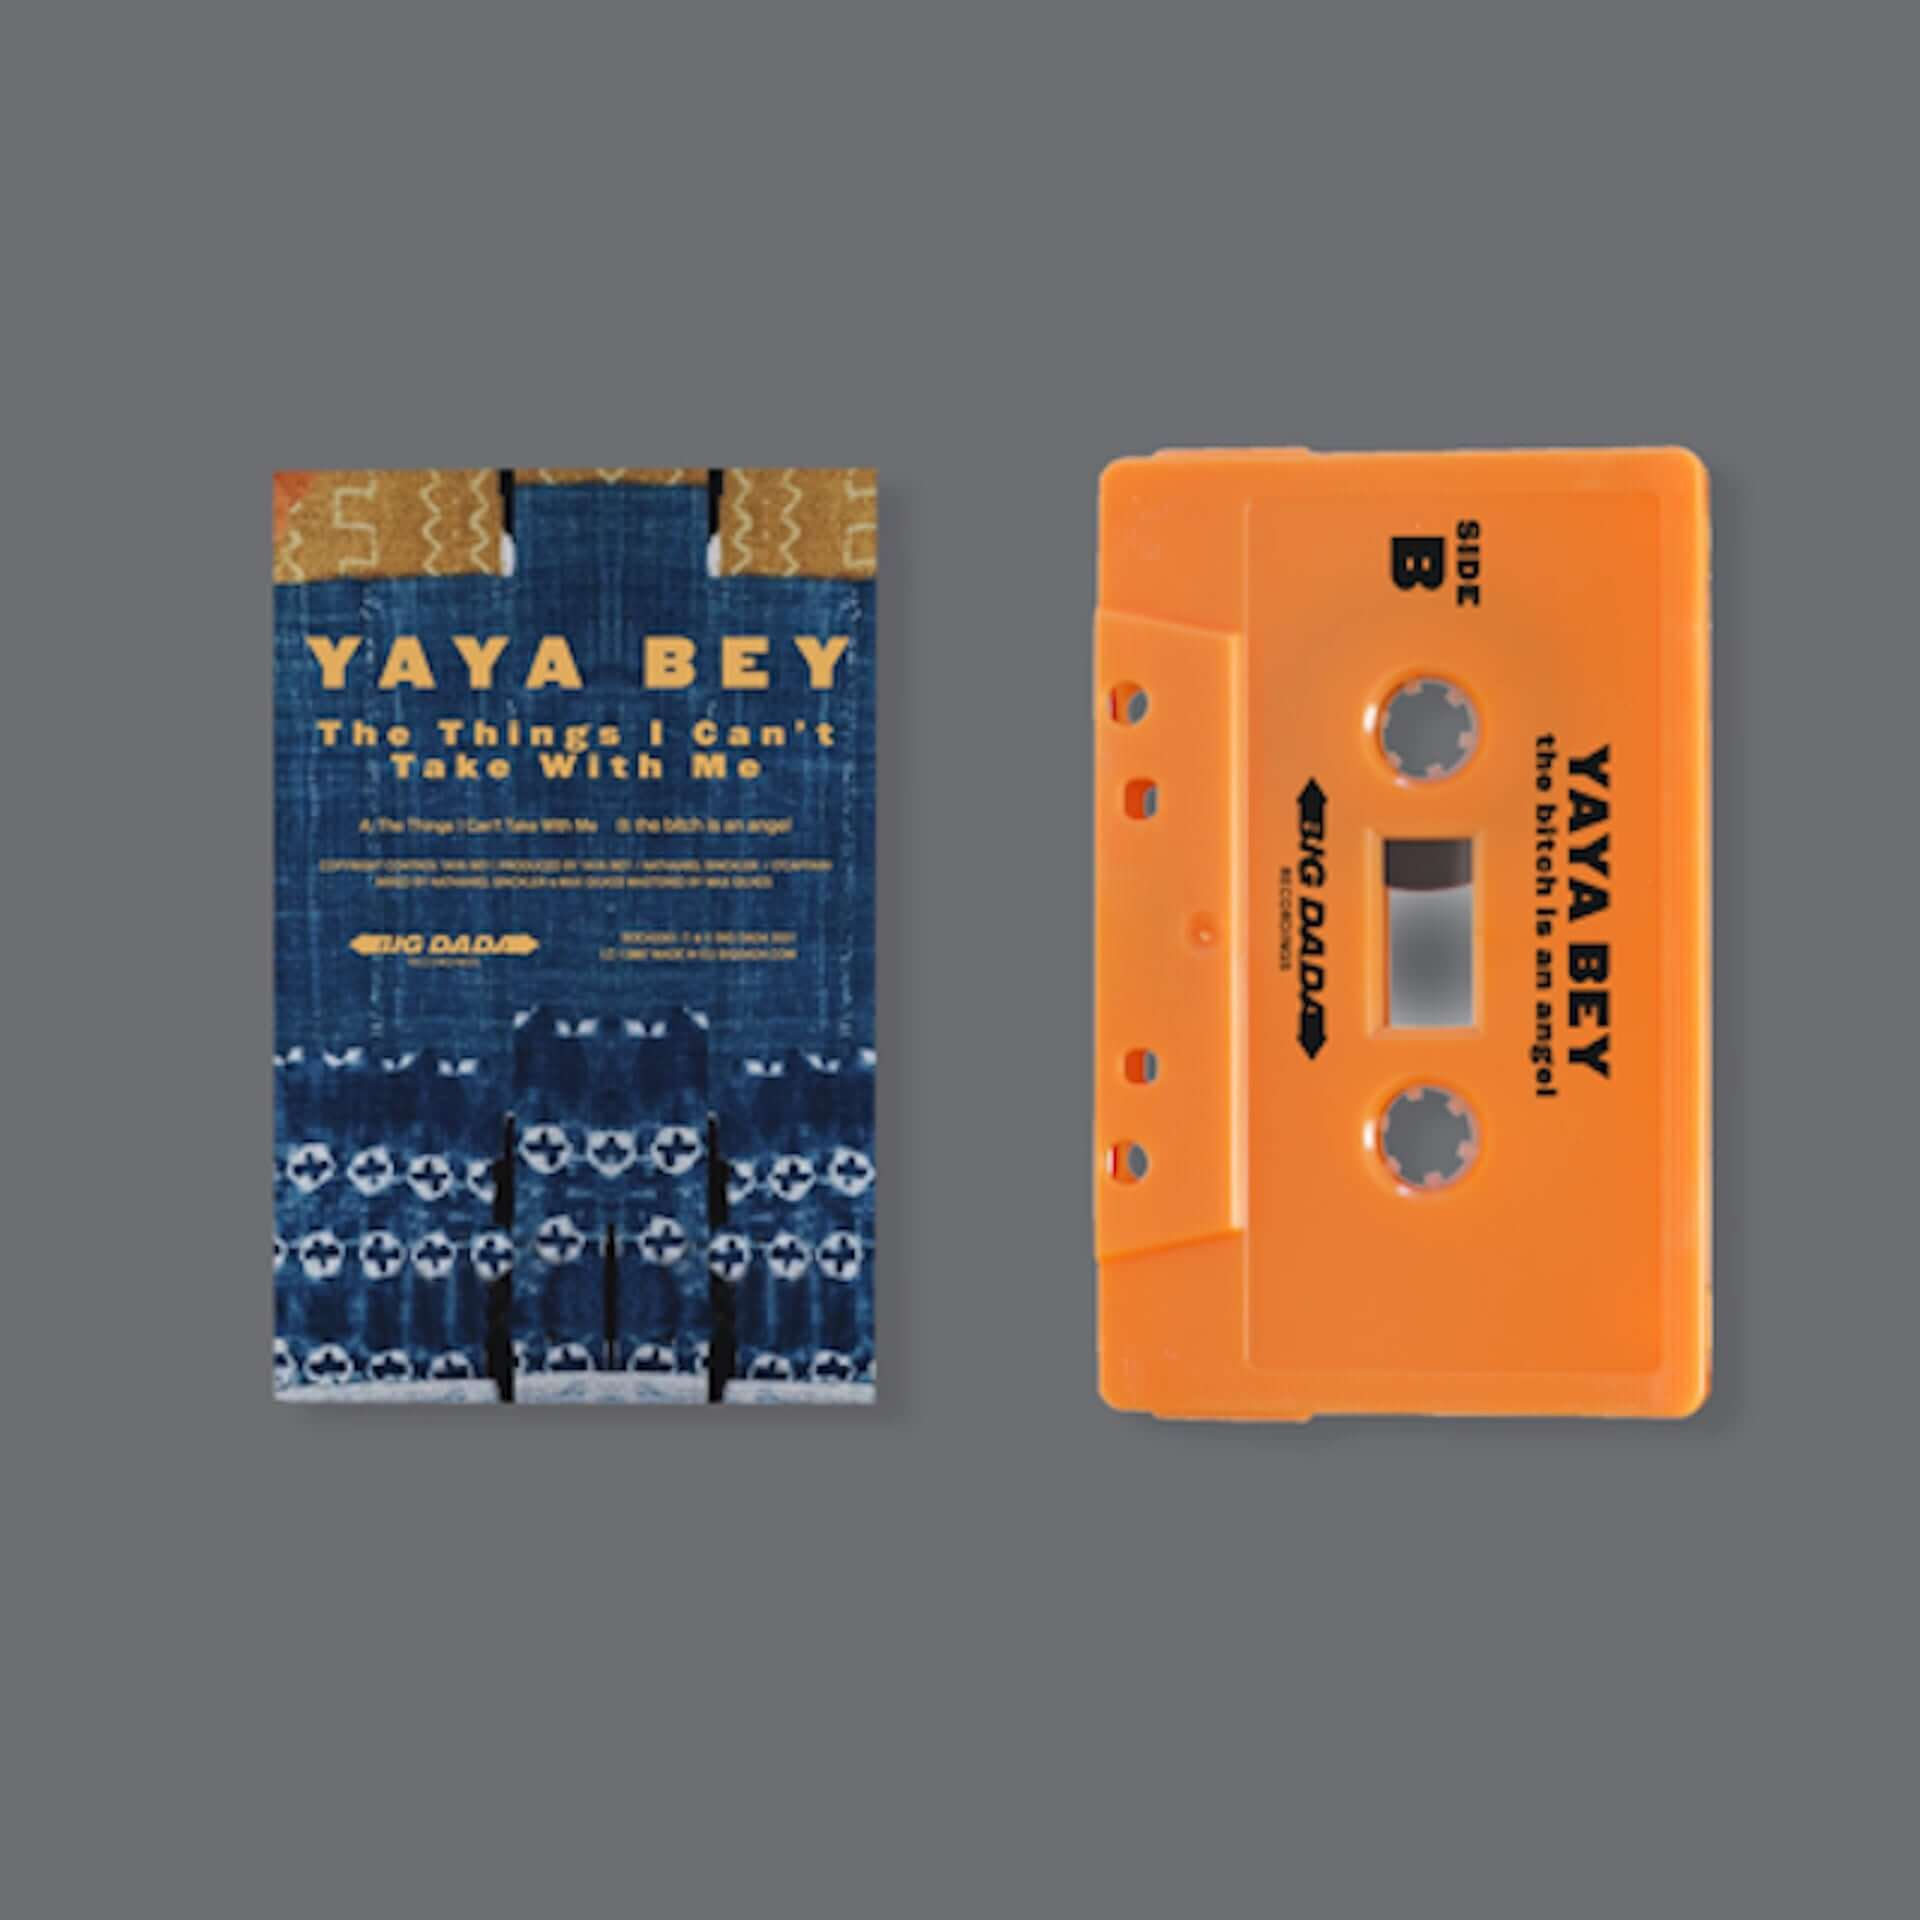 "〈Big Dada〉再始動後のリリース第1弾!Yaya Bey最新EP『The Things I Can't Take With Me』が発売決定&新曲""fxck it then""MVも公開 music210226_yaya-bey_5-1920x1920"